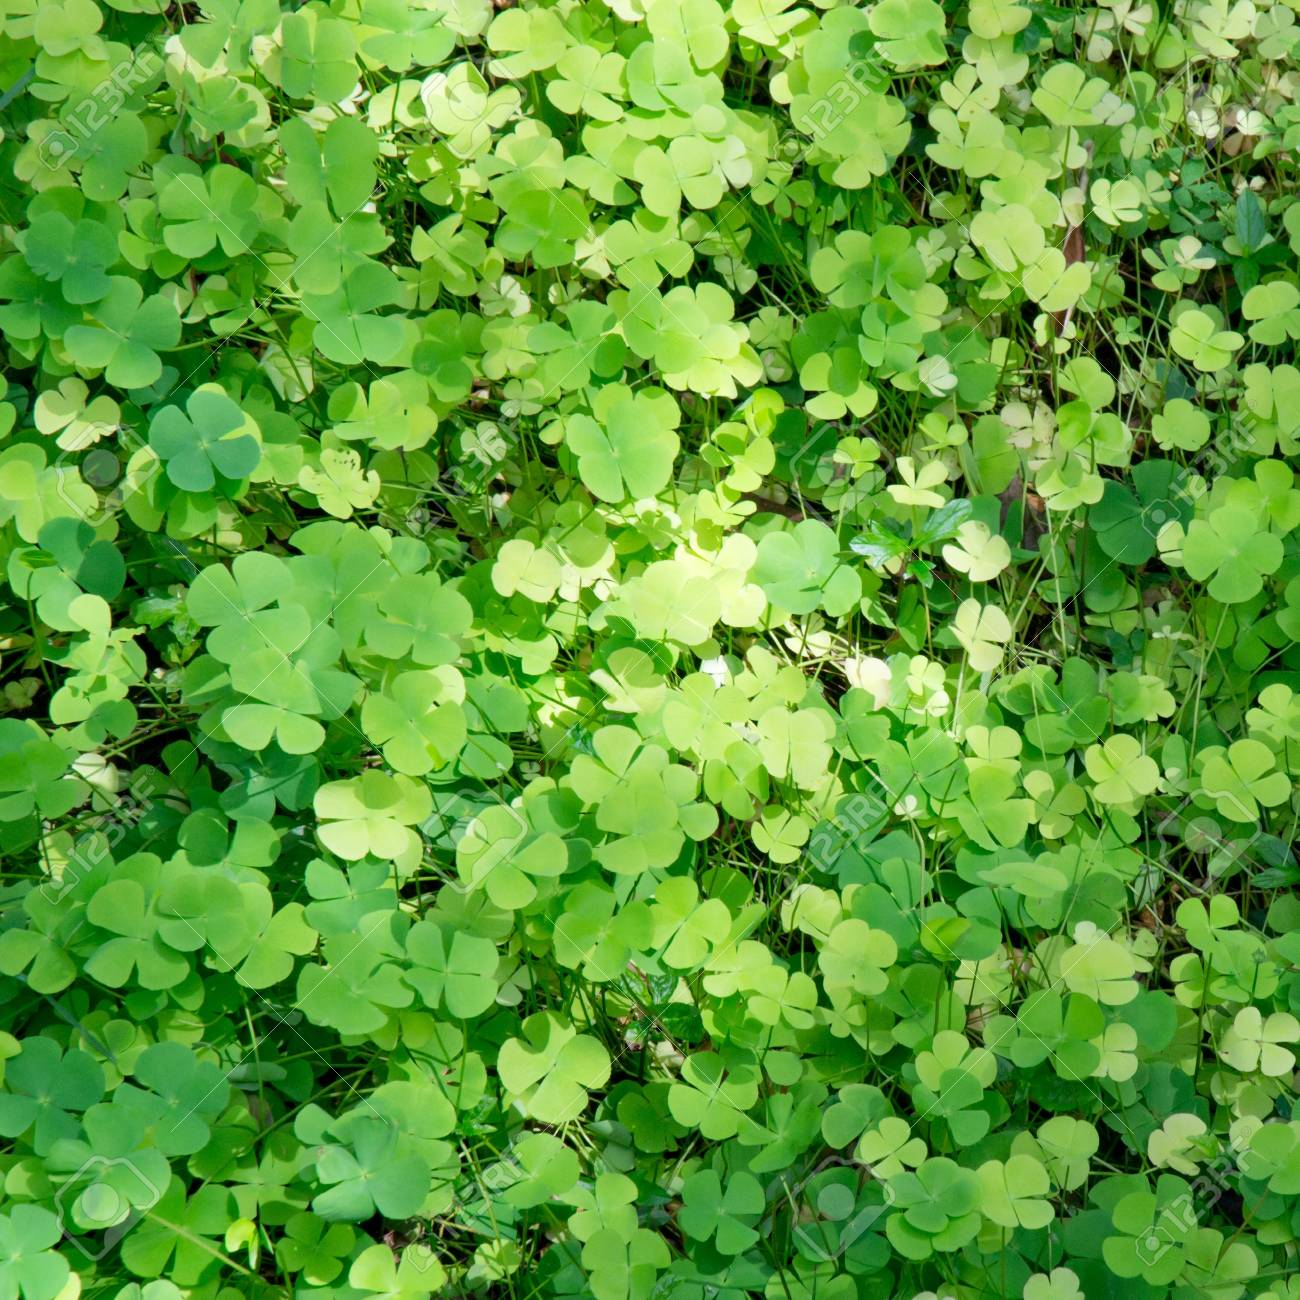 green leaf background Stock Photo - 14061221